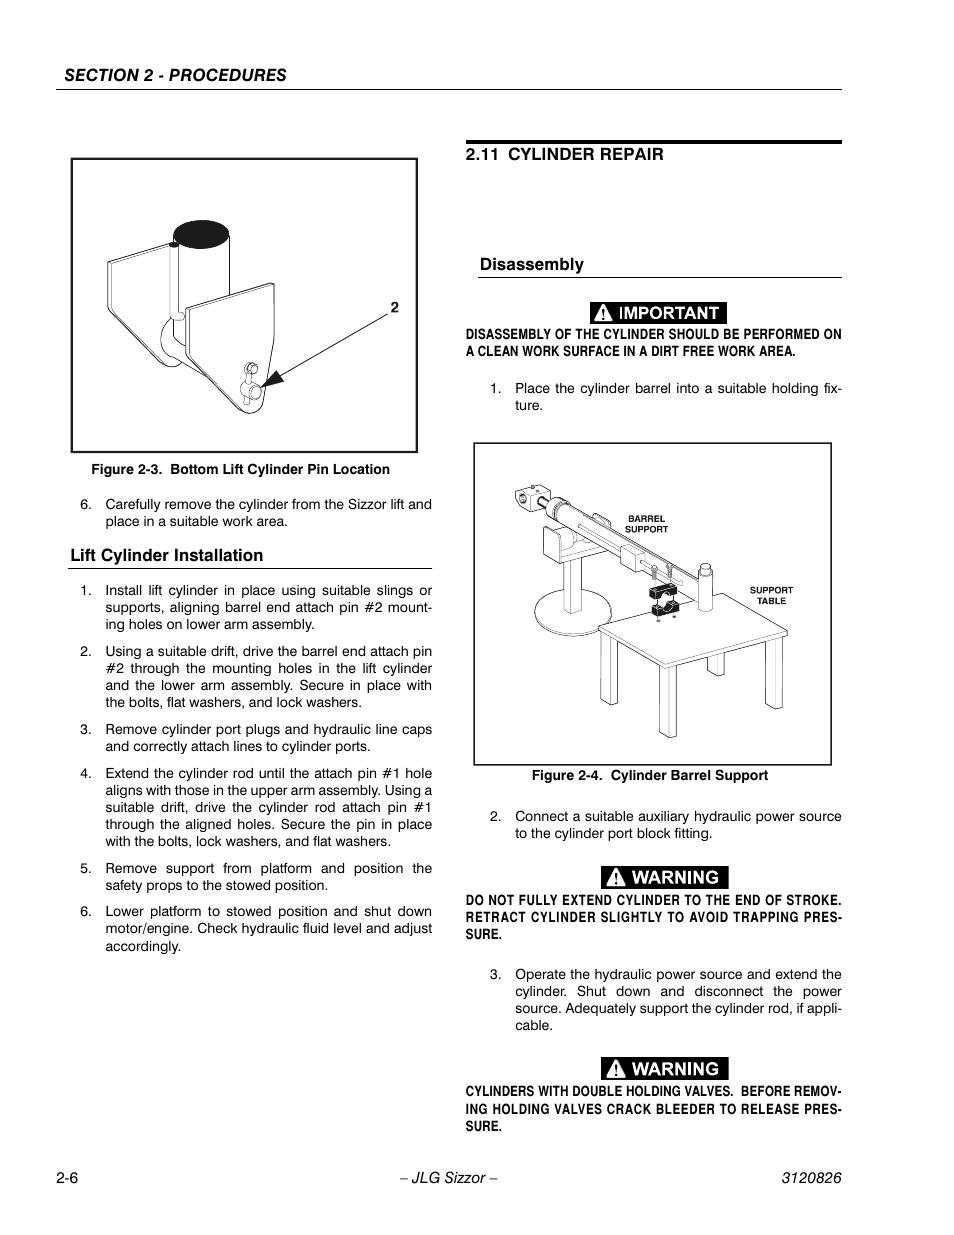 lift cylinder installation 11 cylinder repair disassembly jlg rh manualsdir com Owner's Manual Parts Manual